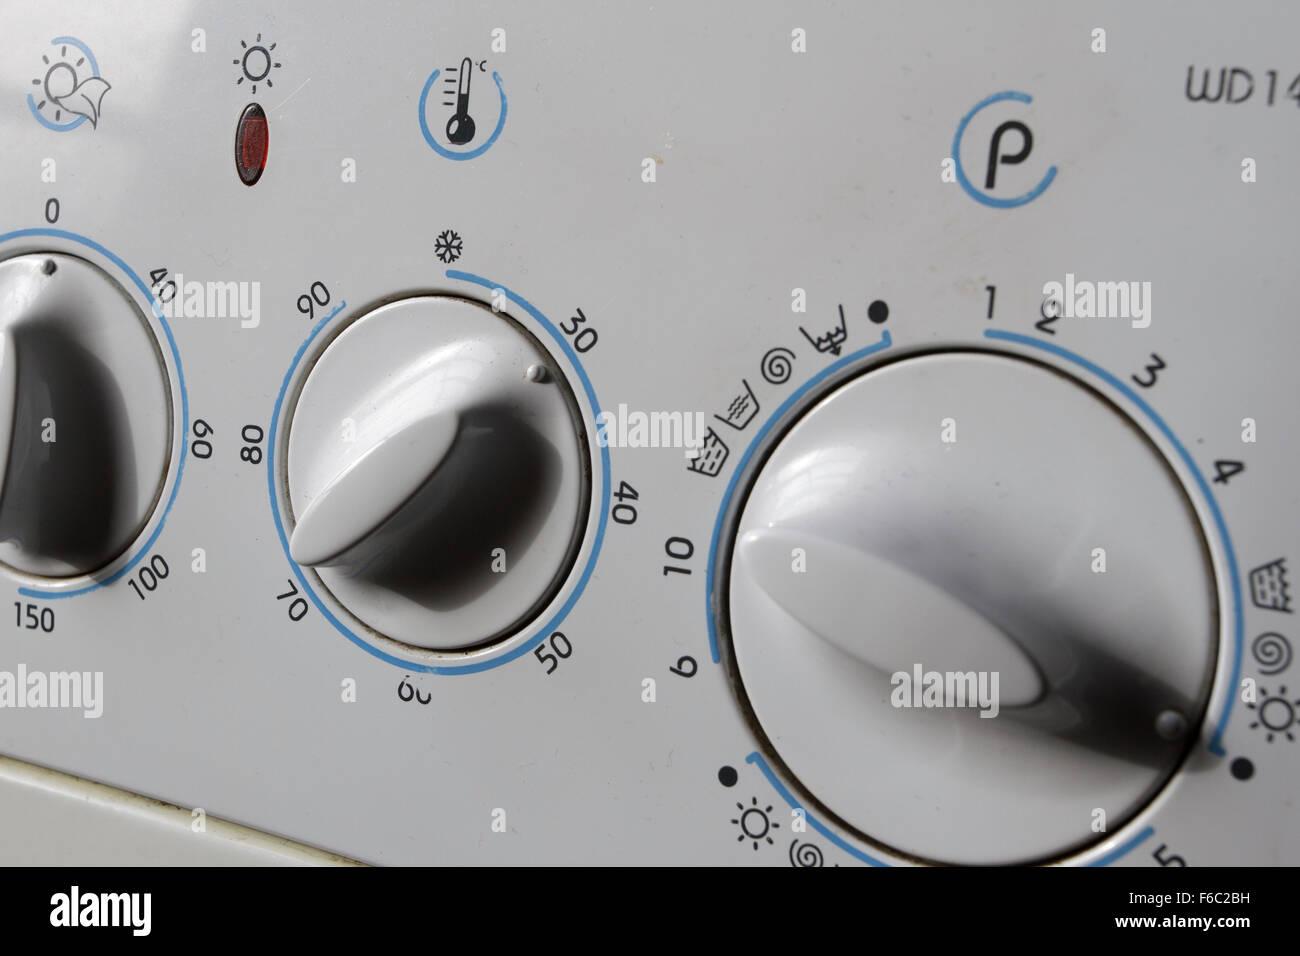 Old washing machine/dryer dials showing 30 degree centigrade wash - Stock Image